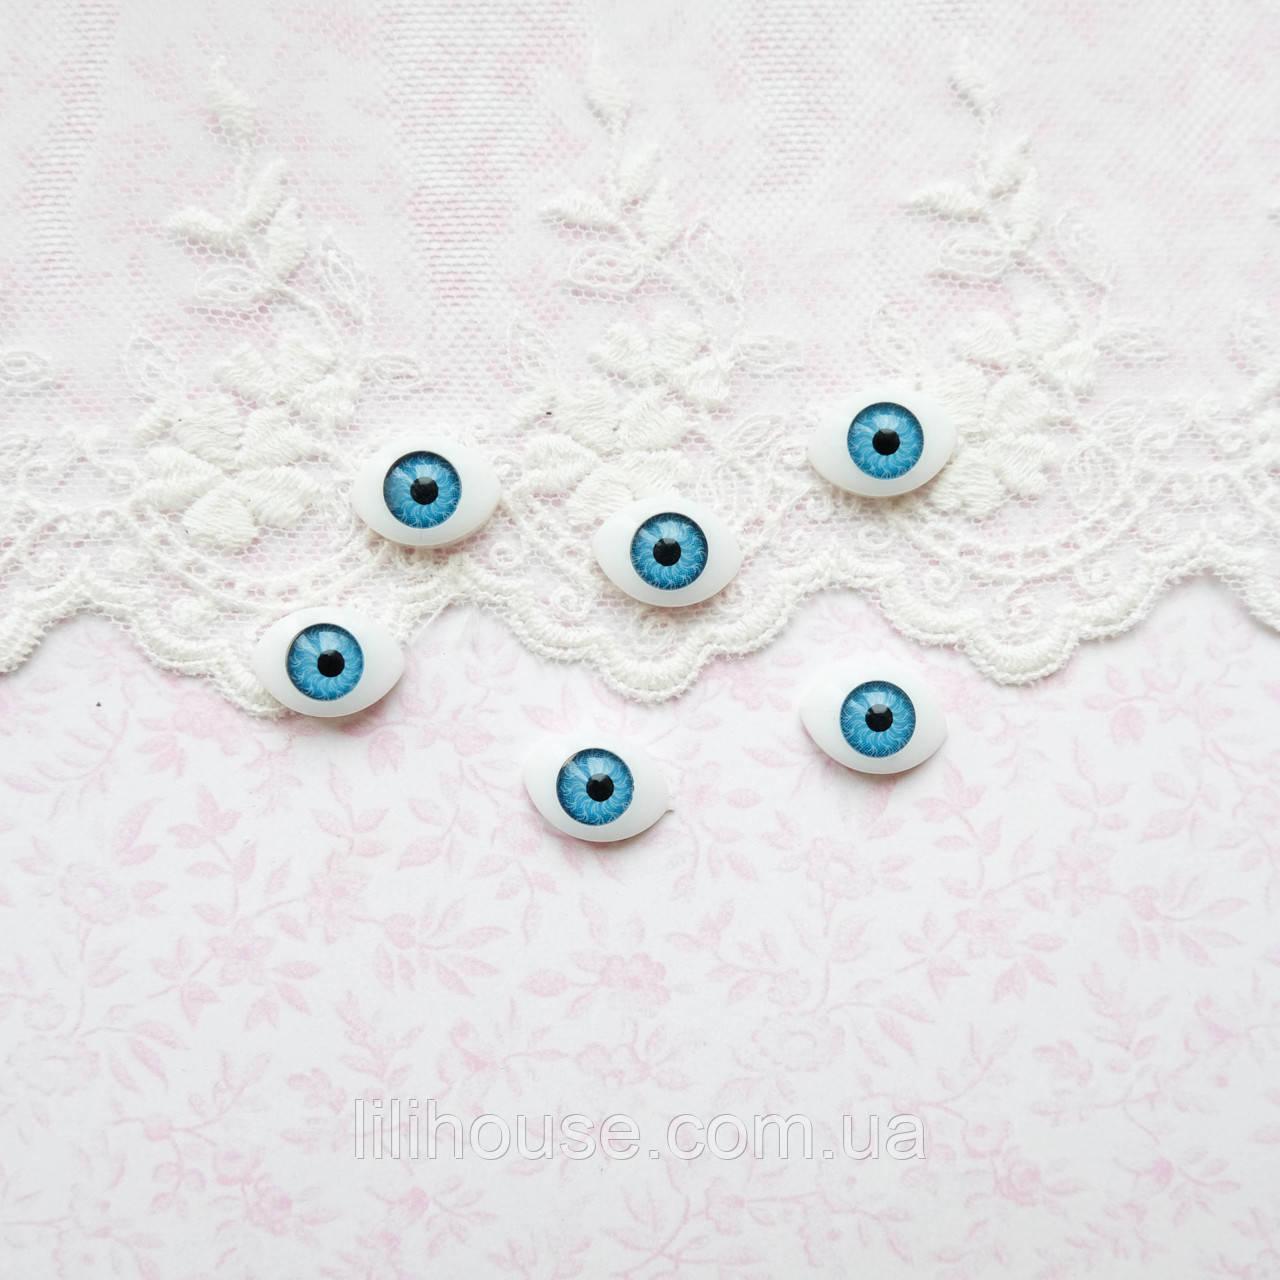 Глазки для Кукол Пластиковые РЫБКИ 10*14 мм БИРЮЗА